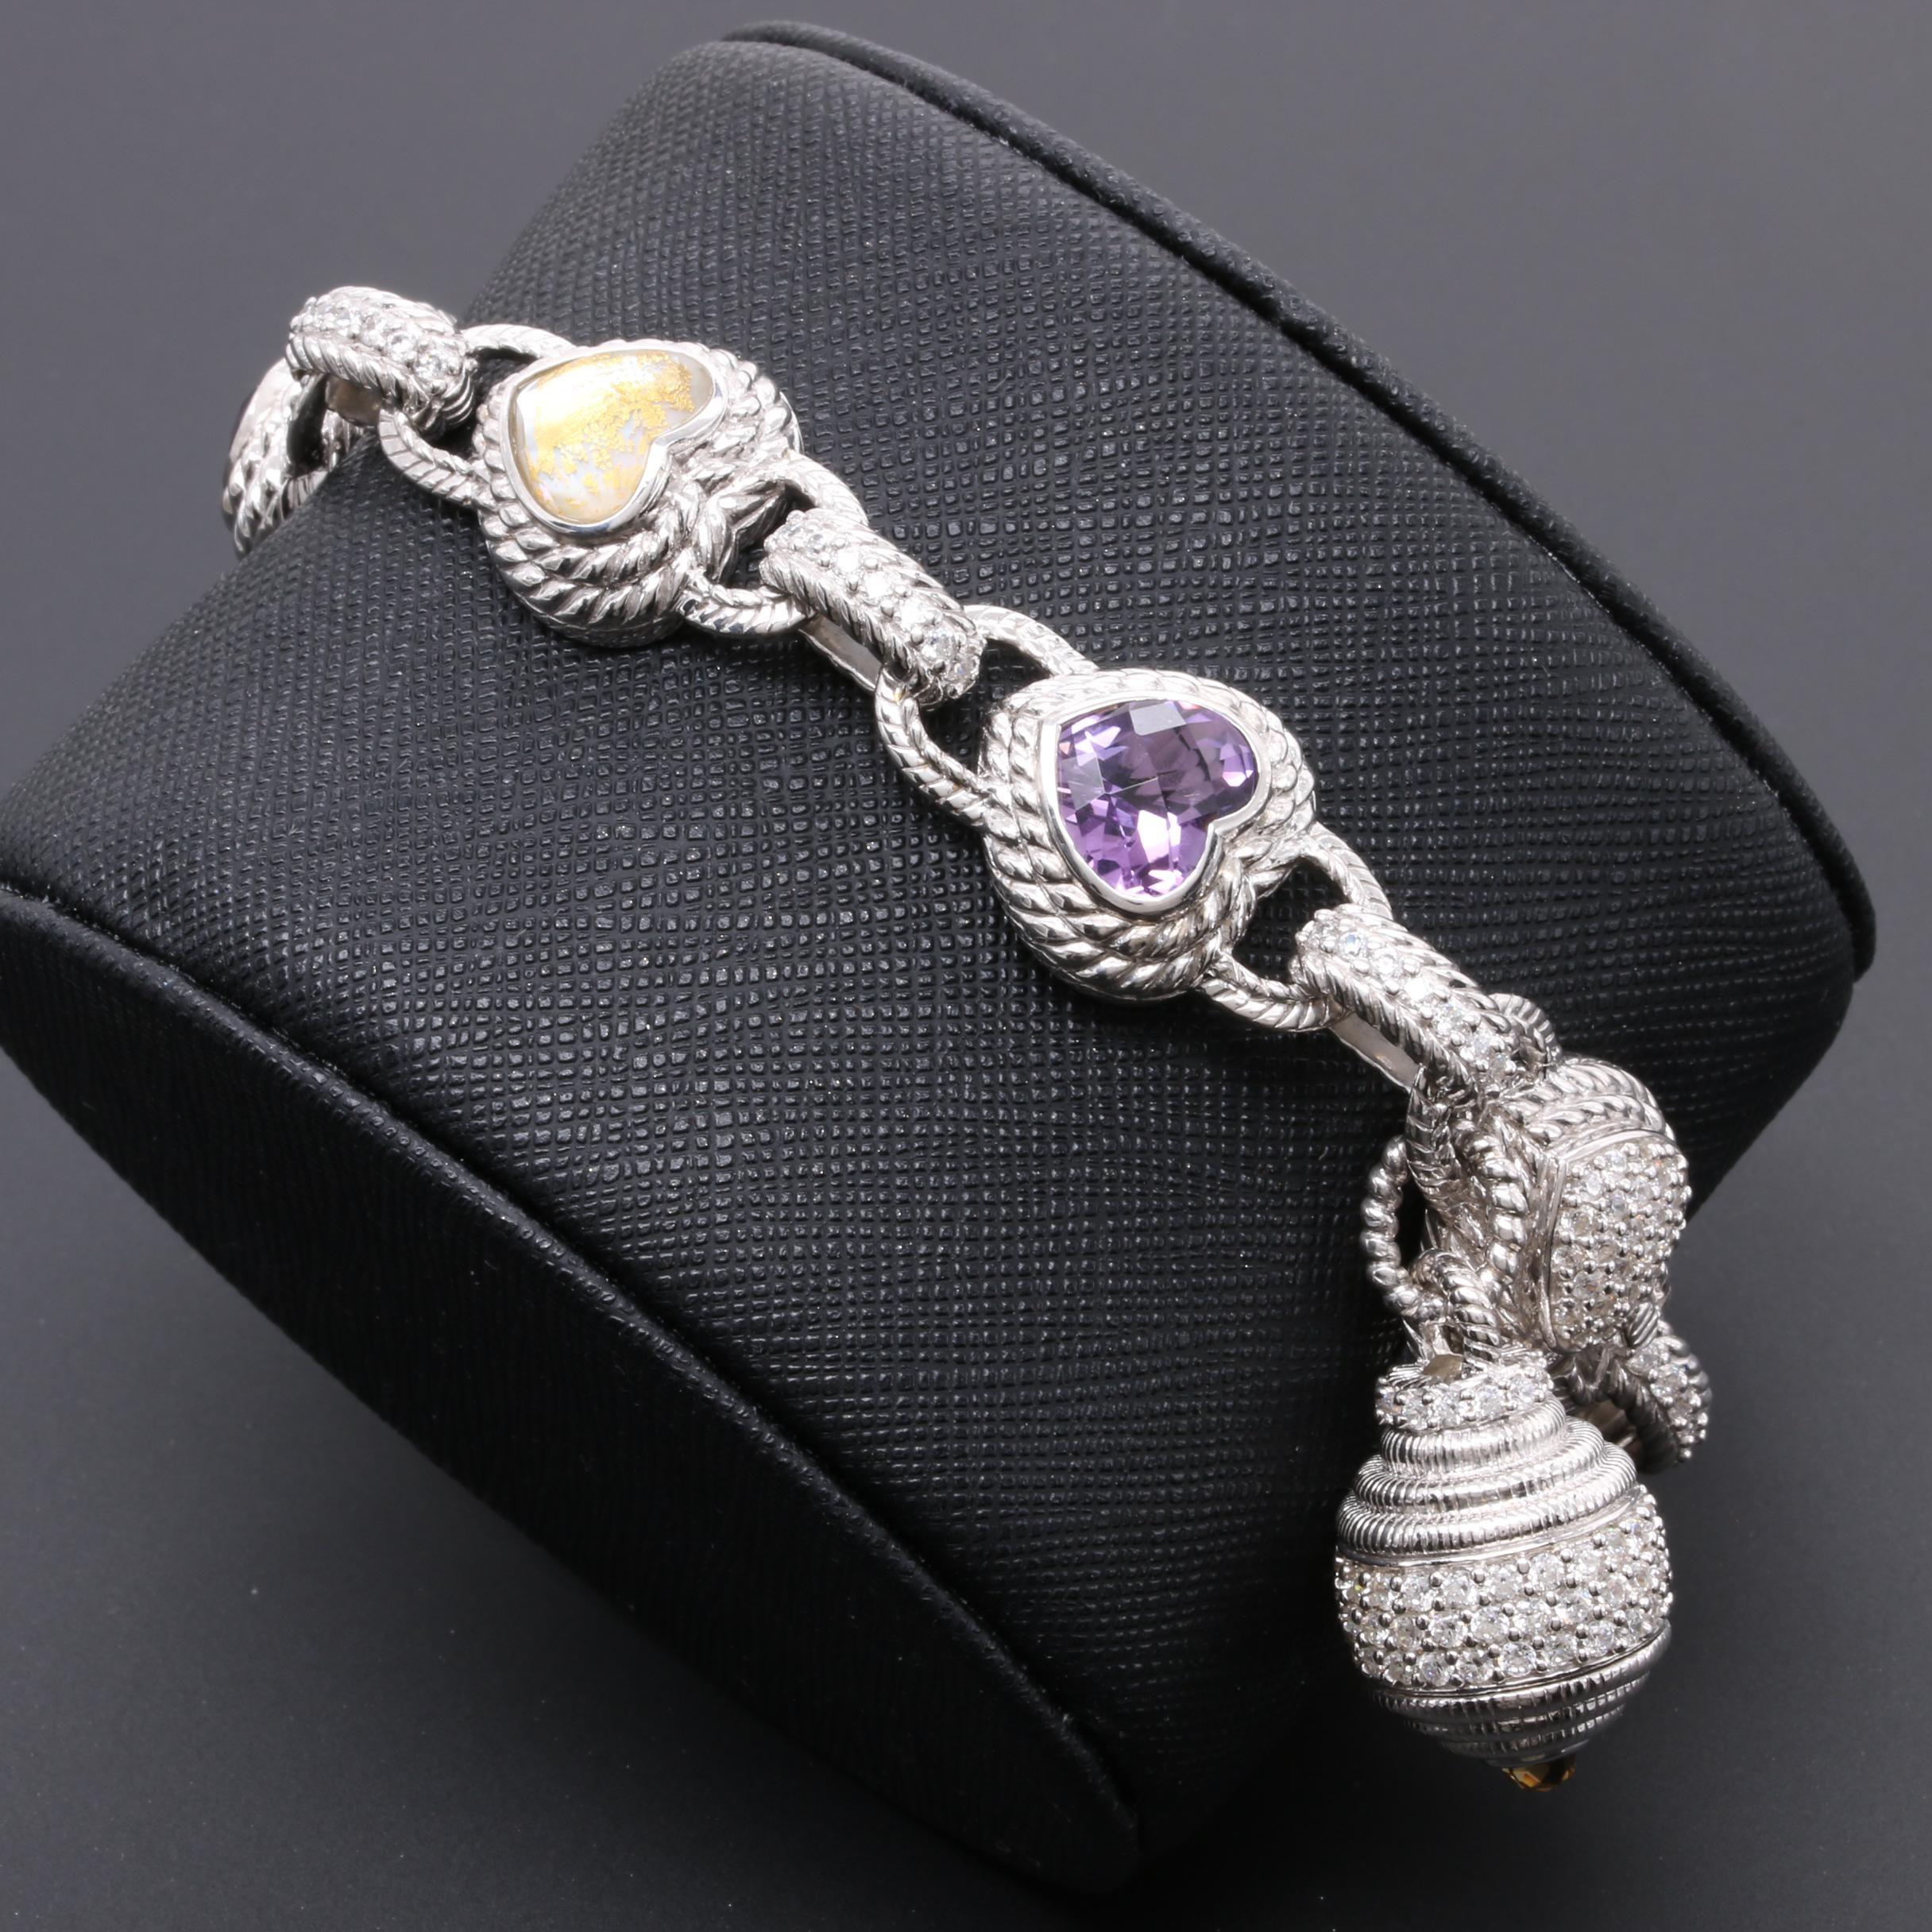 Judith Ripka Sterling Silver Heart Link Bracelet Featuring Amethyst